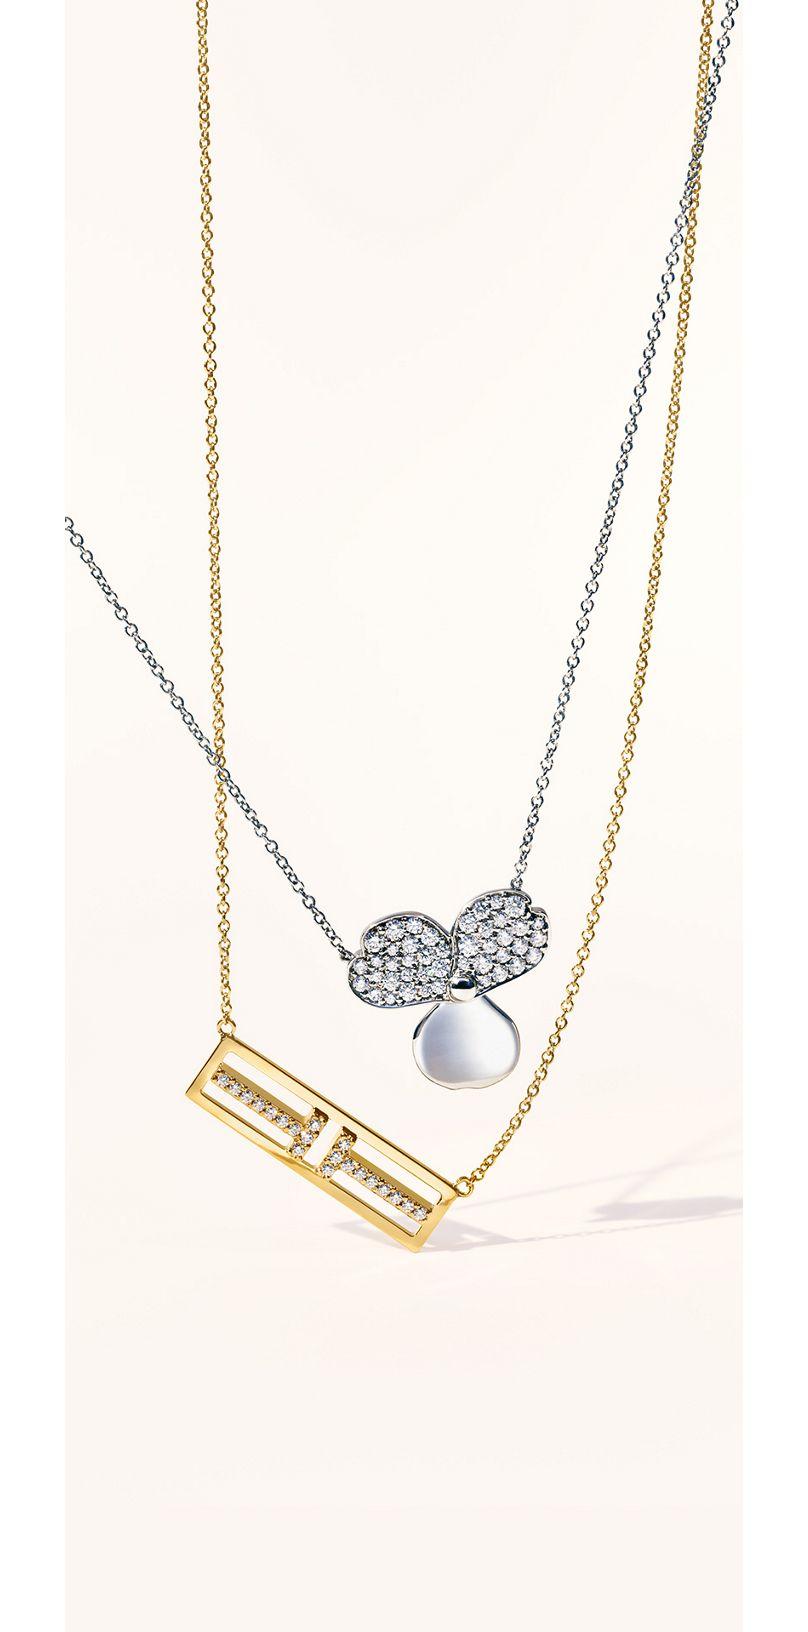 Gioielli Tiffany 9441fb944901